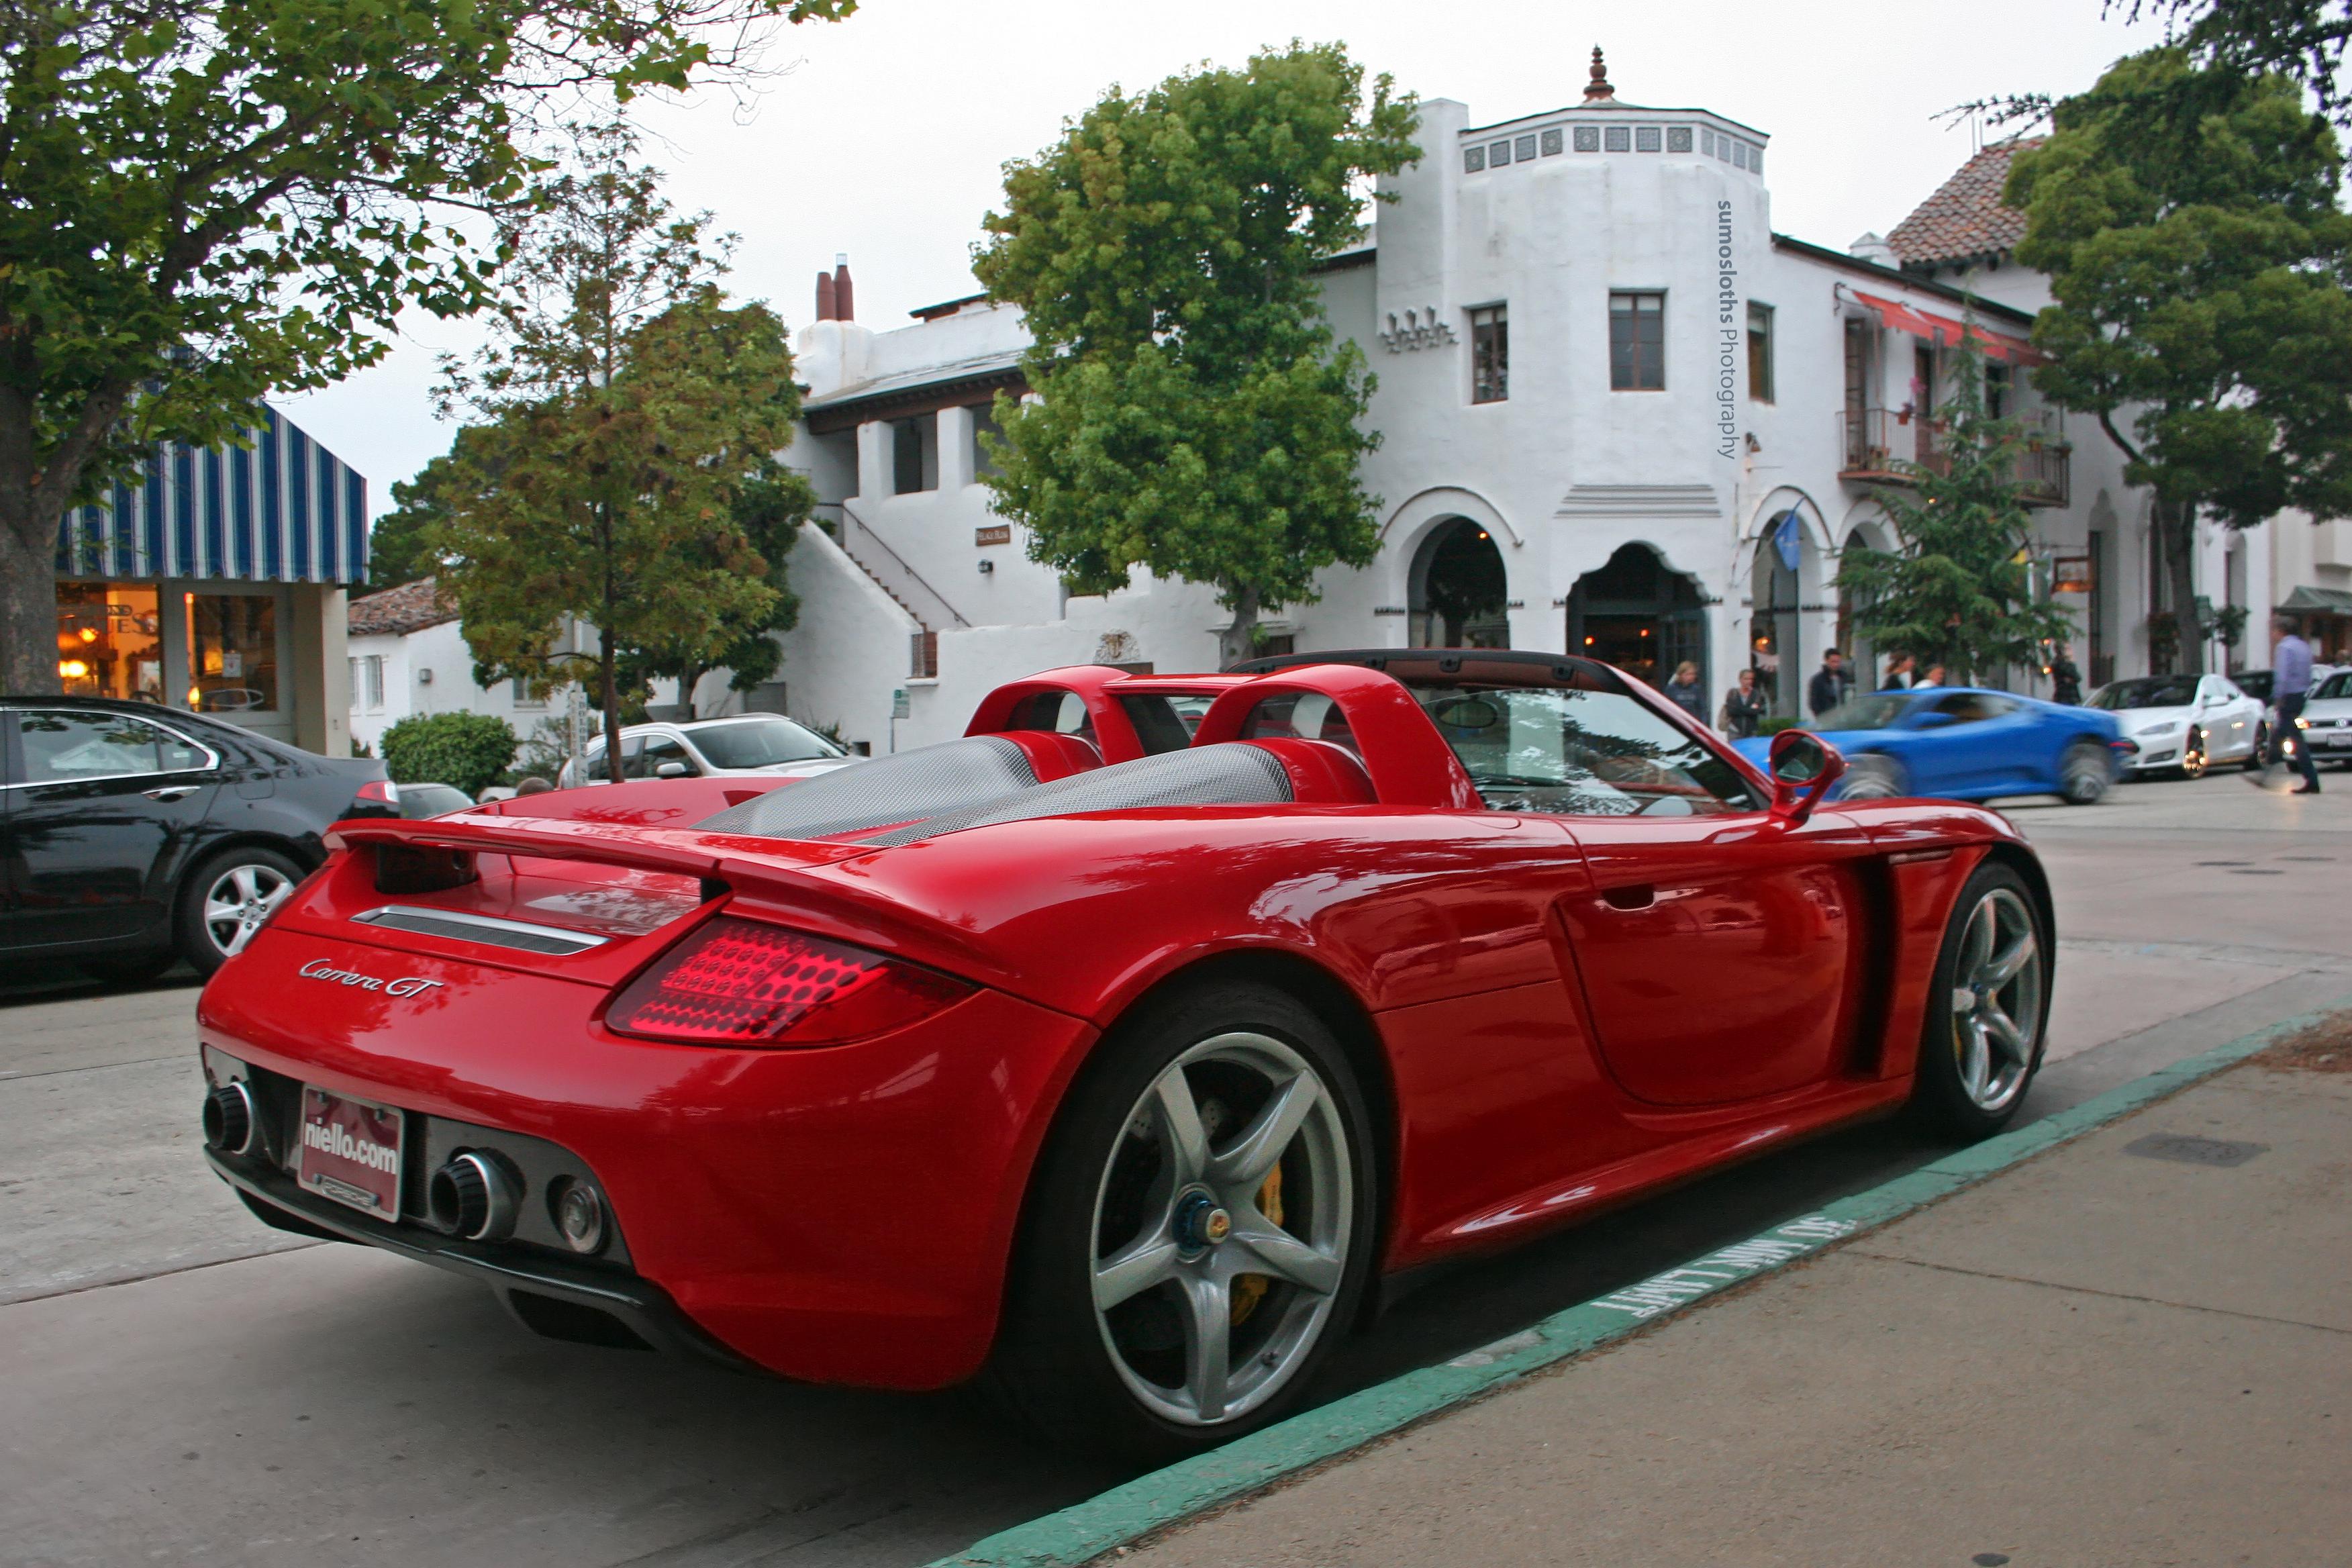 ocean-street-blue-red-beach-apple-car-logo-Monterey-downtown-Ipod-gorgeous-side-Ferrari-spot-Spyder-pebble-ave-Porsche-carmel-week-spotted-GT-avenue-carrera-F430-combo-430-918-cgt-carspotting-sumosloths-756873 Interesting Hinh Anh Xe Porsche 918 Spyder Cars Trend